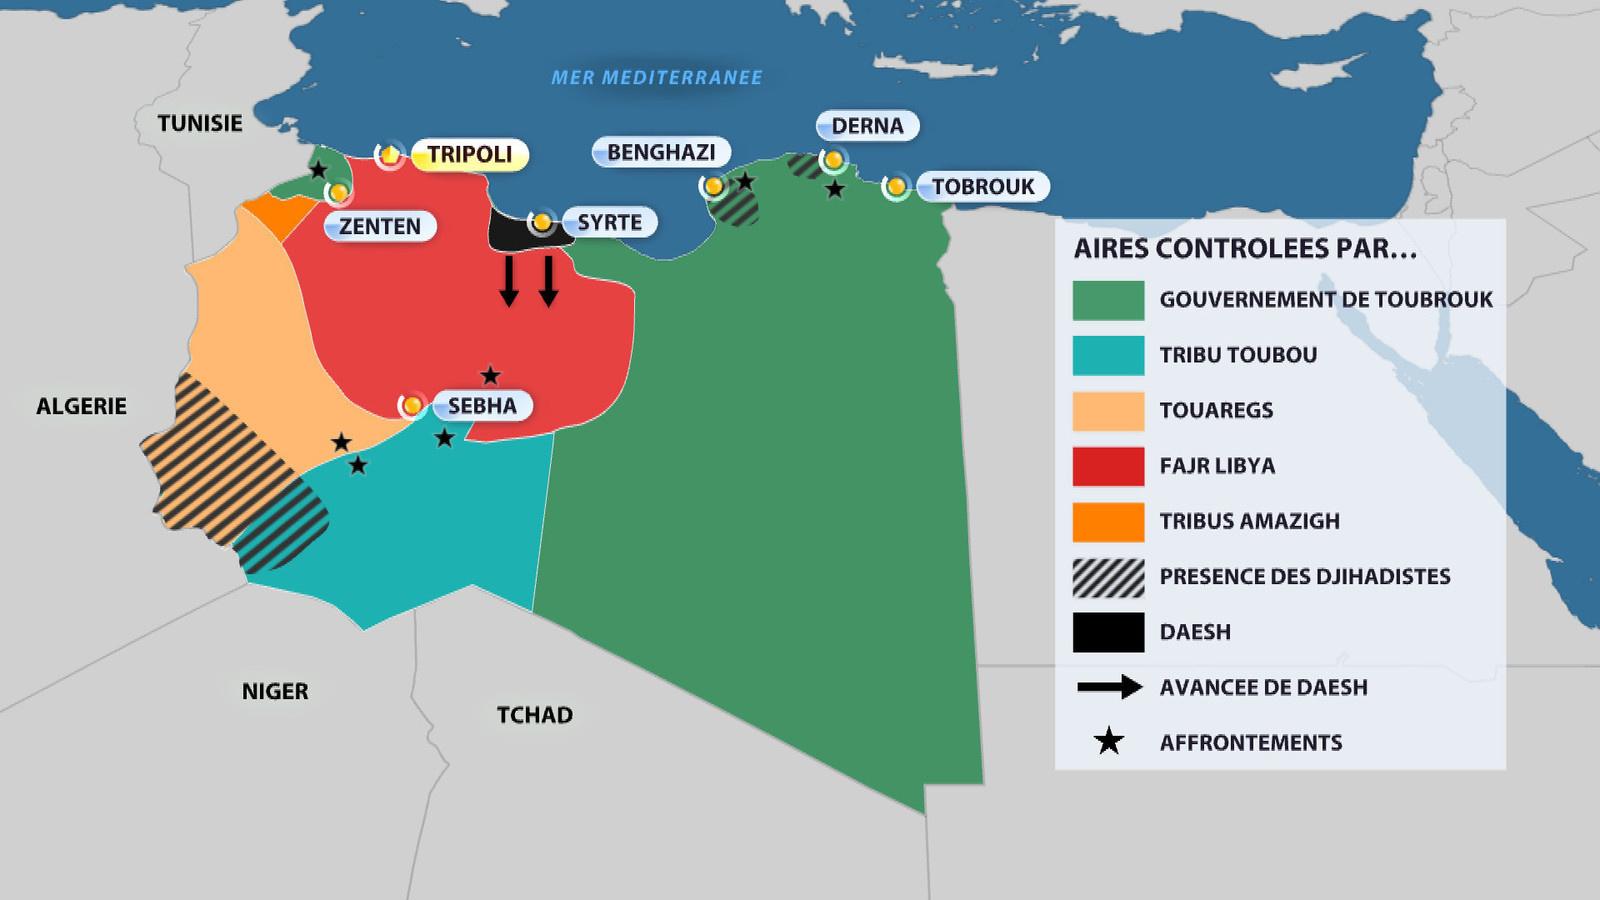 LIBIA (carte LIMES)